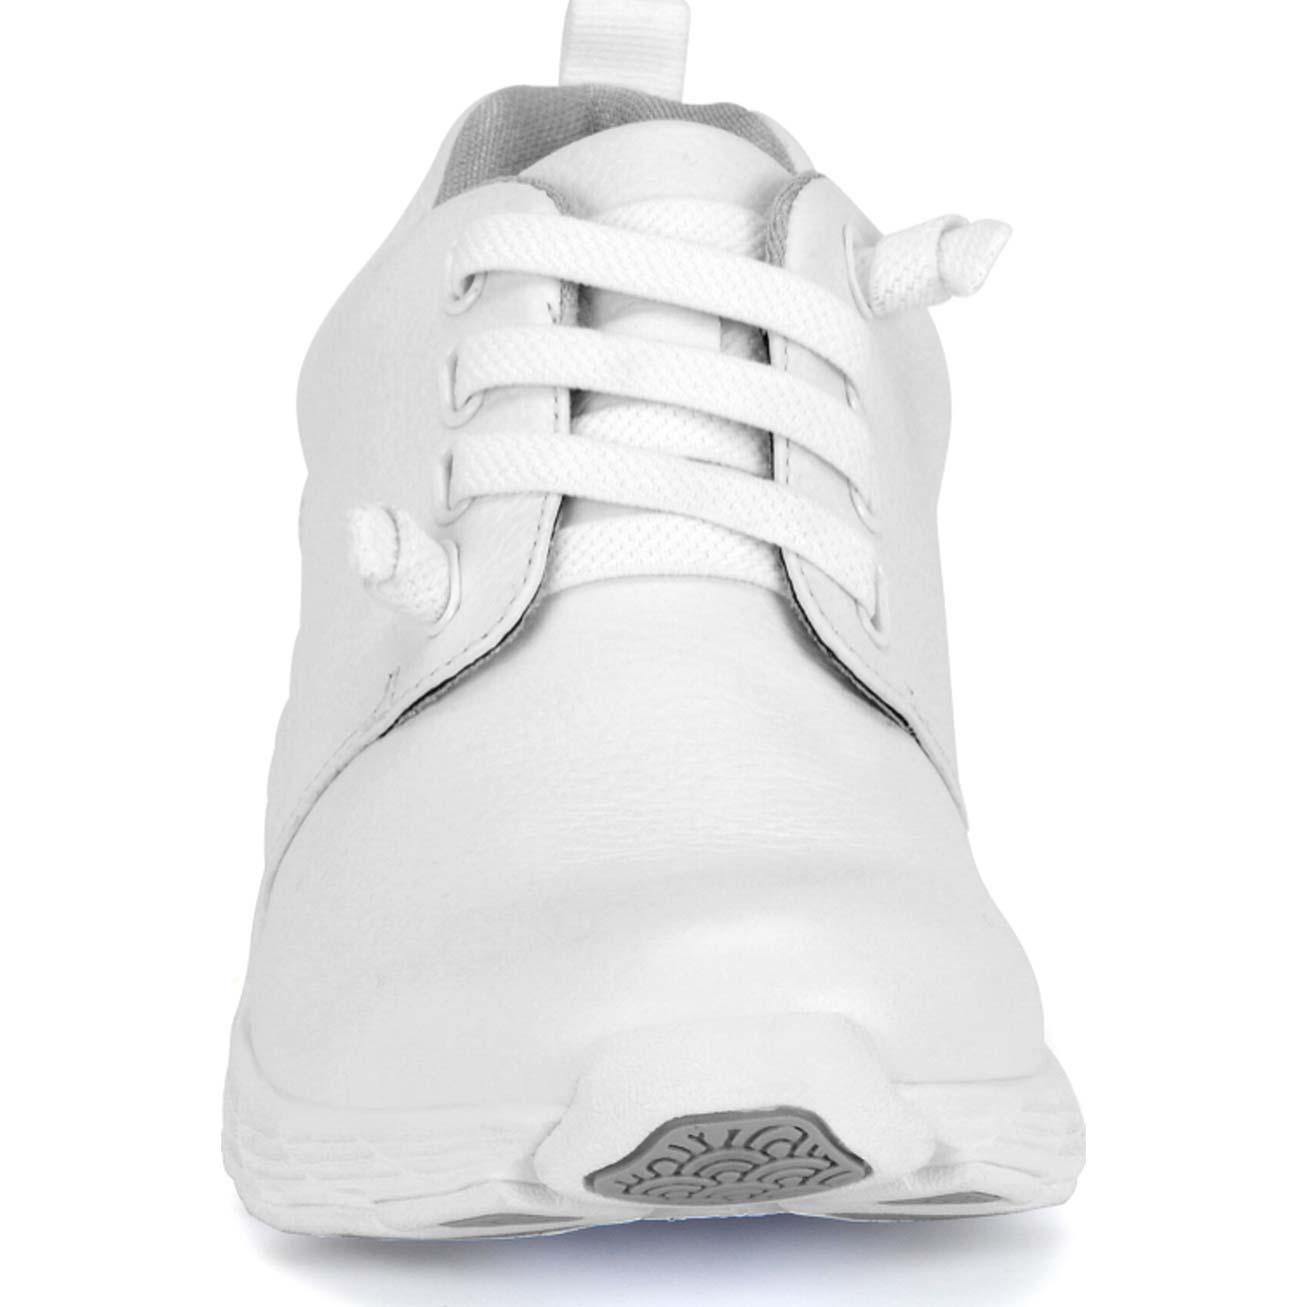 Align By Nurse Mates Women S Velocity Shoe